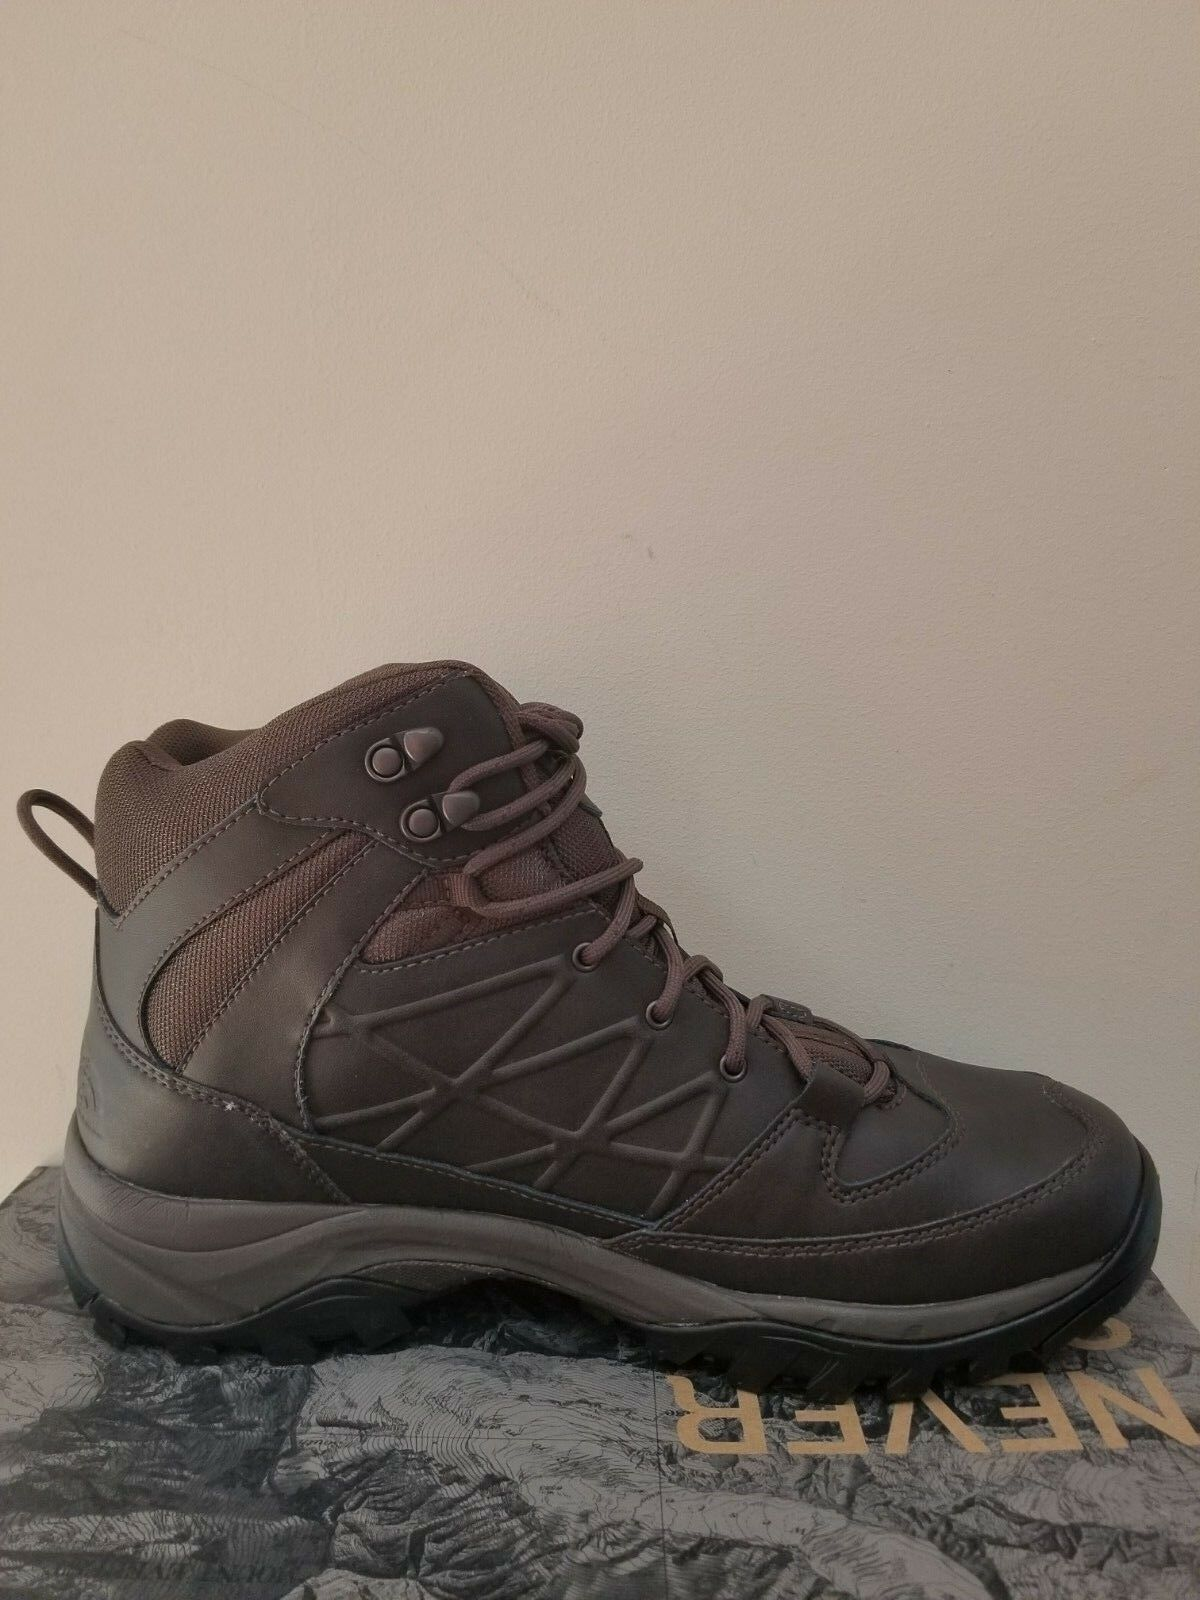 compra meglio THE NORTH FACE Uomo Storm Mid Waterproof Waterproof Waterproof Leather Hiking stivali Dimensione 11.5 NIB  designer online